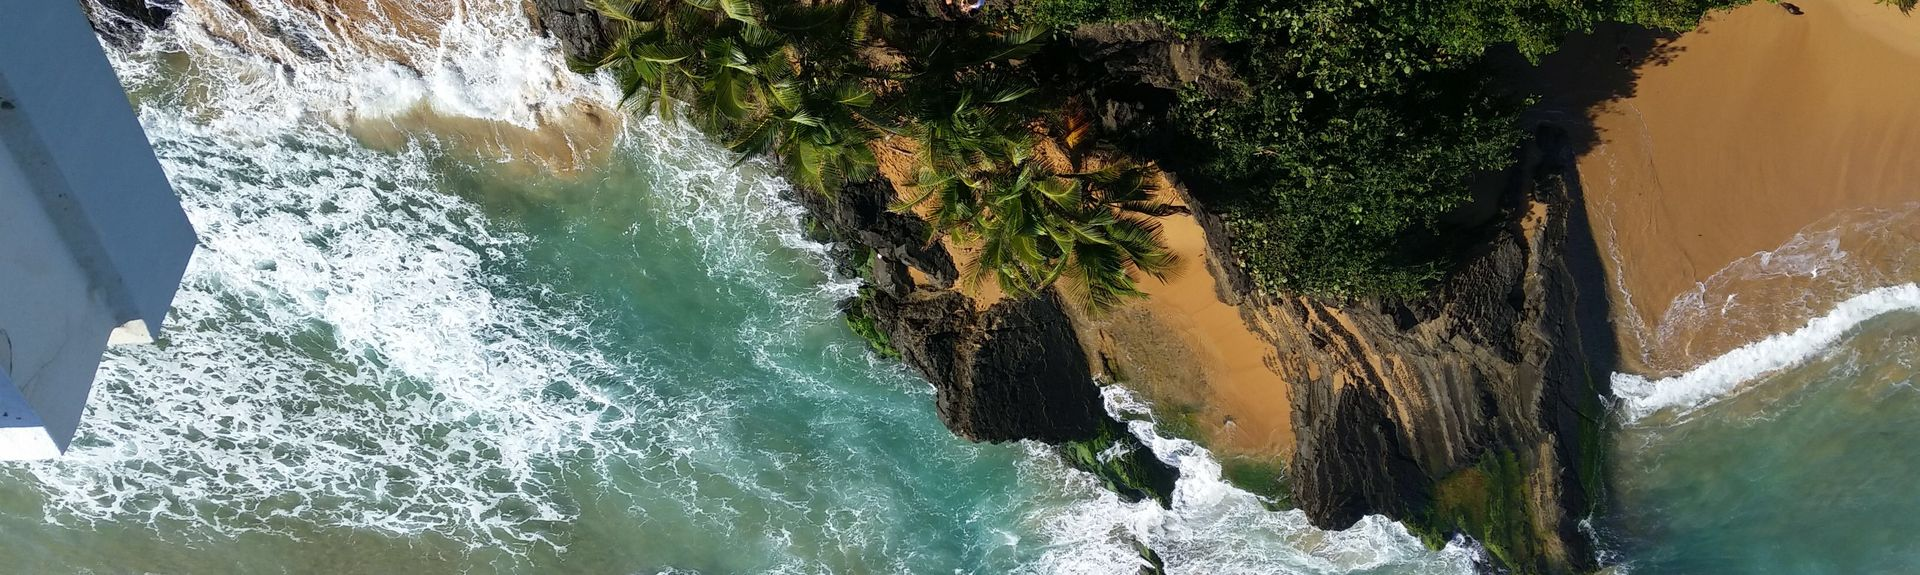 Vilomar, Mata de Plátano, Luquillo, Porto Rico